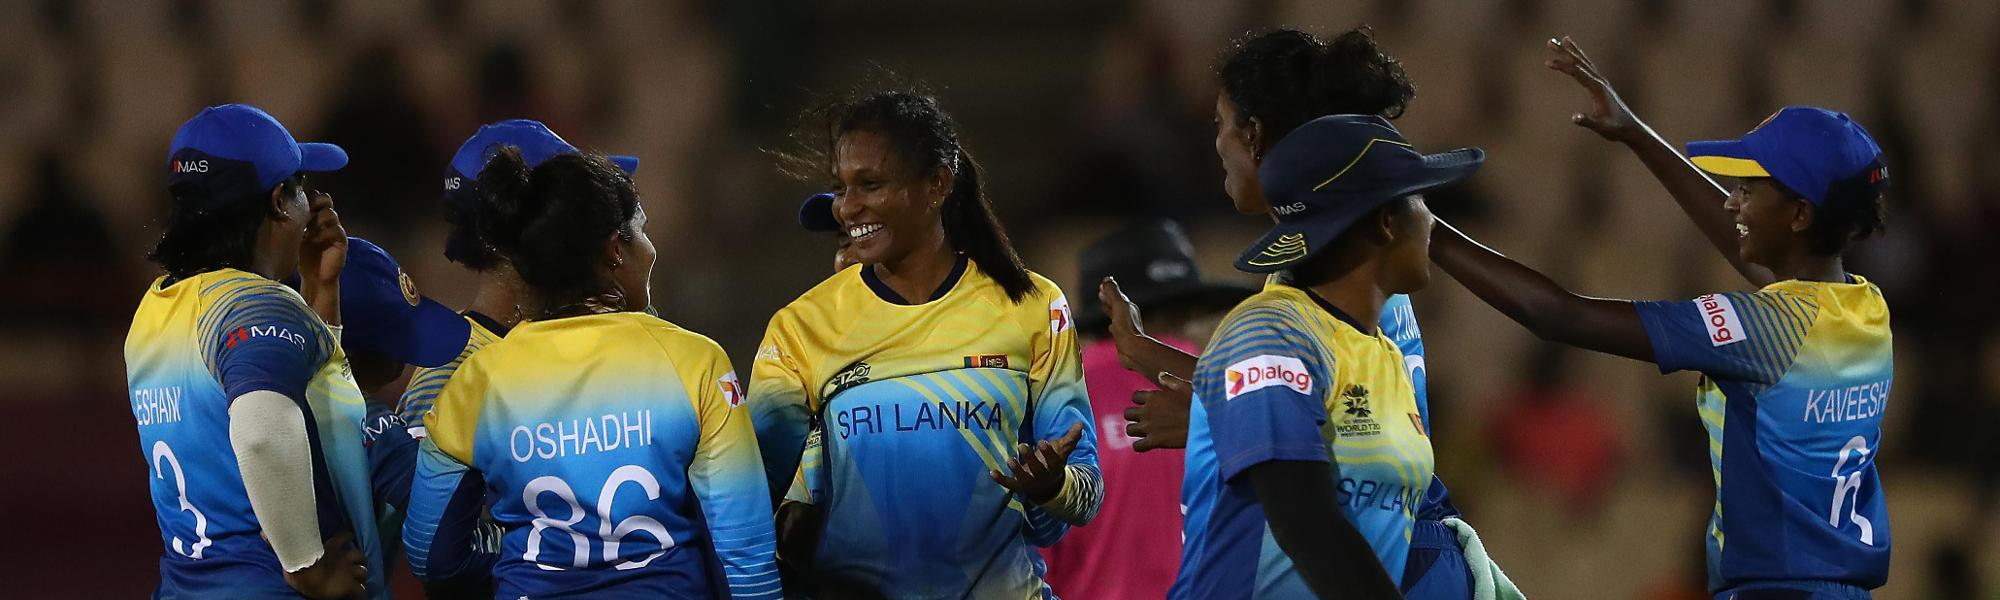 Inoshi Priyadharshani of Sri Lanka celebrates bowling Shamima Sultana of Bangladesh during the ICC Women's World T20 2018 match between Sri Lanka and Bangladesh at Darren Sammy Cricket Ground on November 14, 2018 in Gros Islet, Saint Lucia.